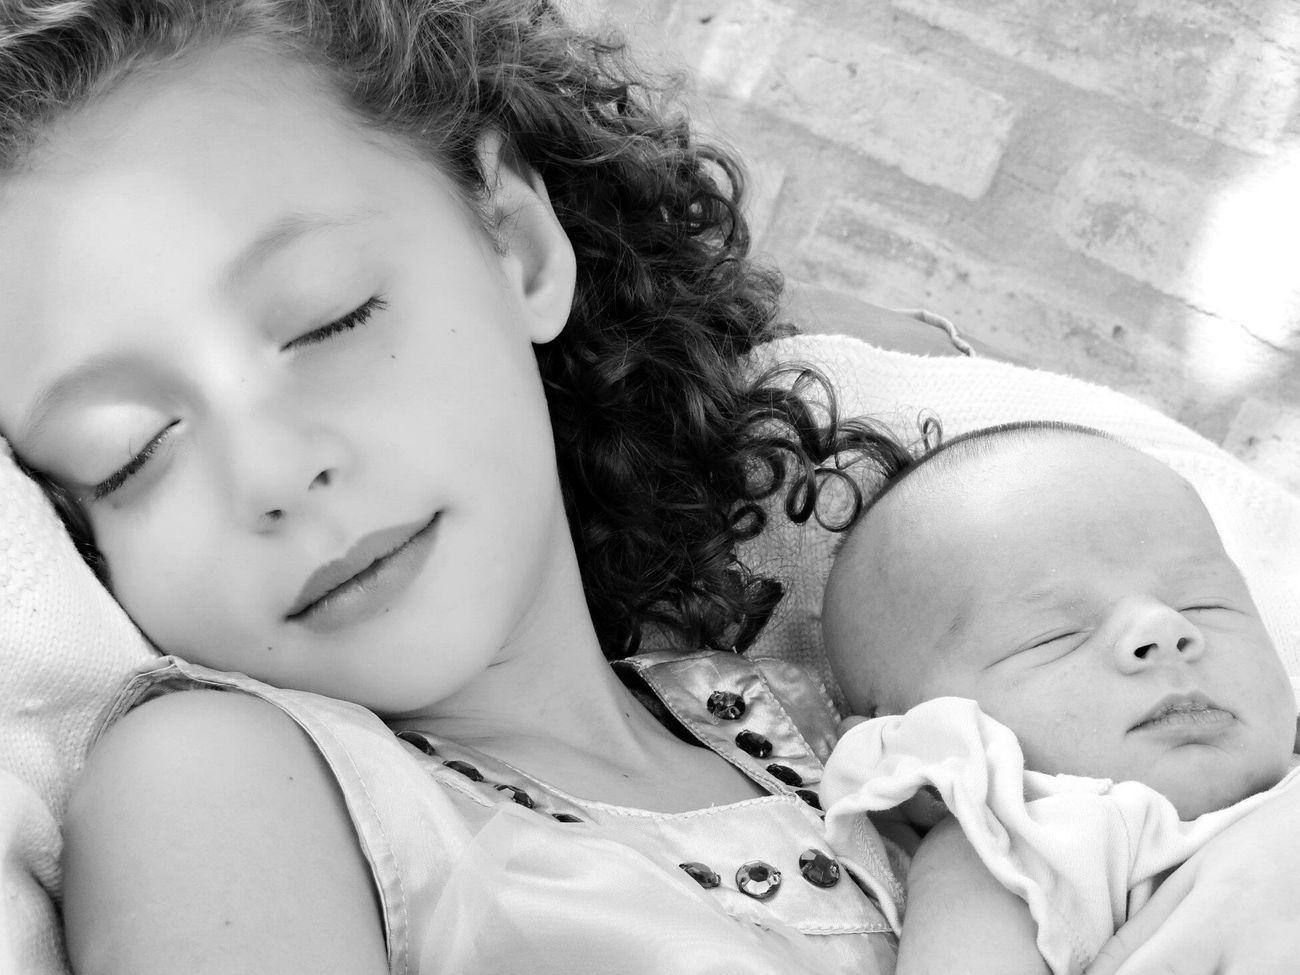 Ternura Day Innocence Sleeping Childhood Relaxation Cute Resting Girls Innocence Tranquility Fragility Kids Sisters Hermanas Sister Hermana Ternura Cuteness